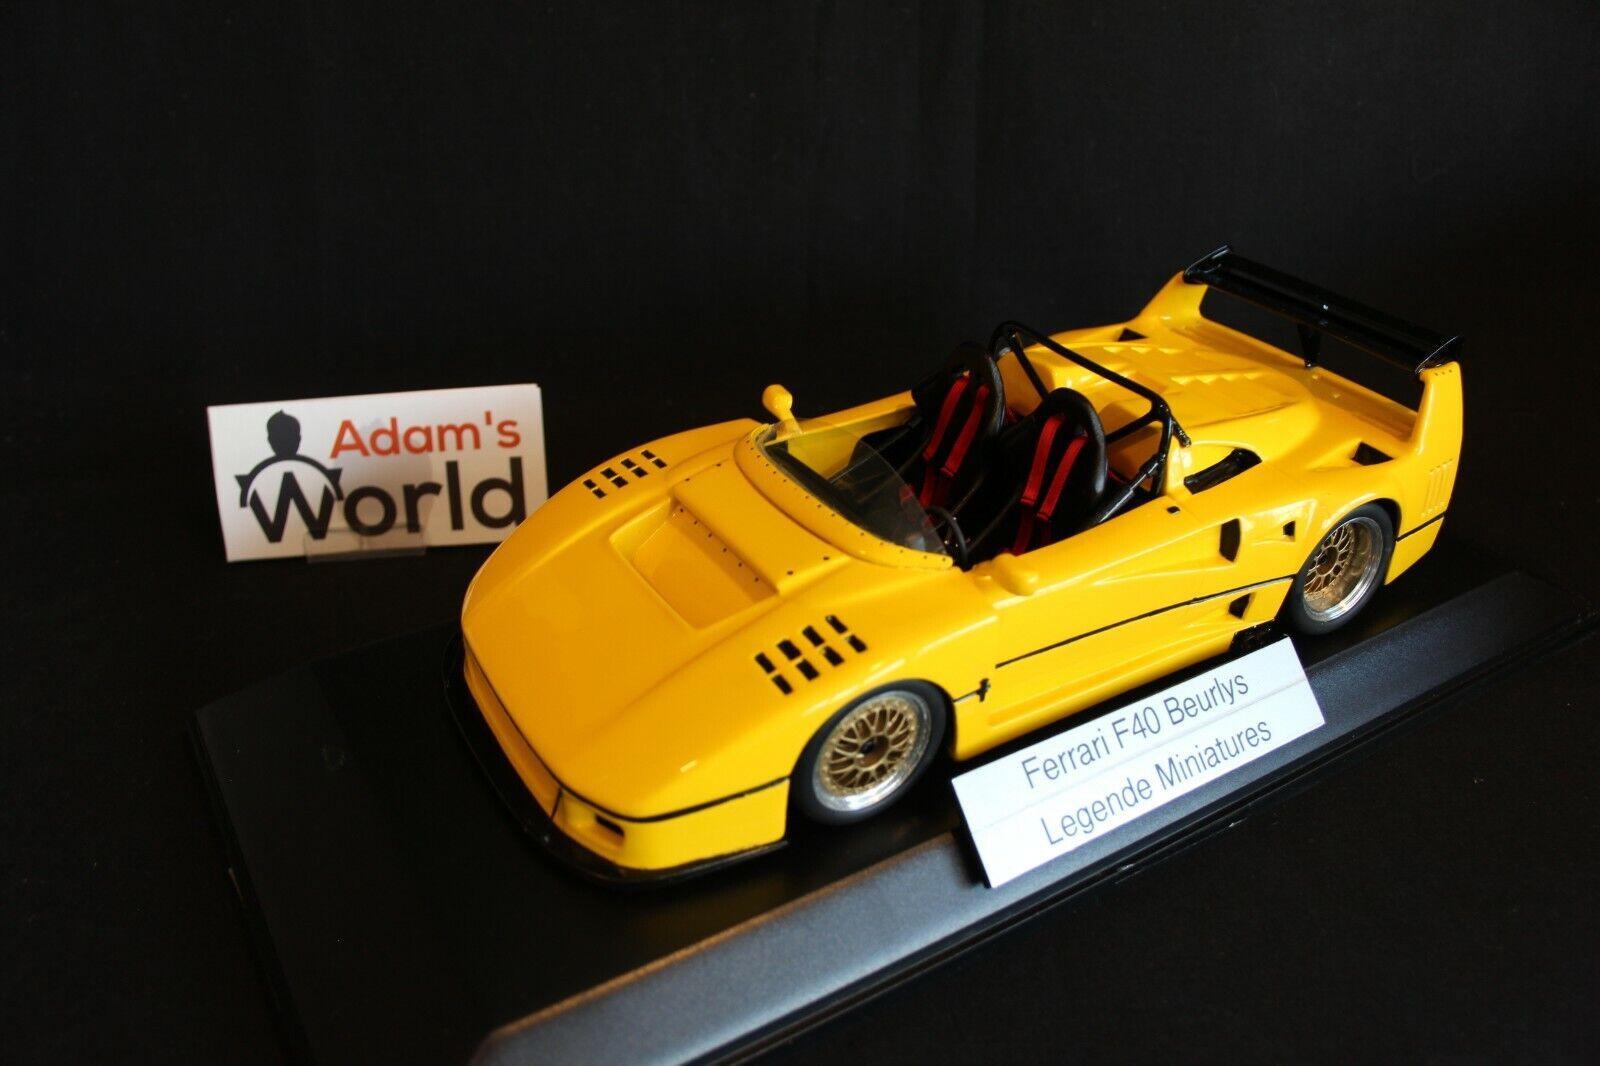 Legende Miniatures built kit resin Ferrari F40 Beurlys 1 18 Gelb (PJBB)